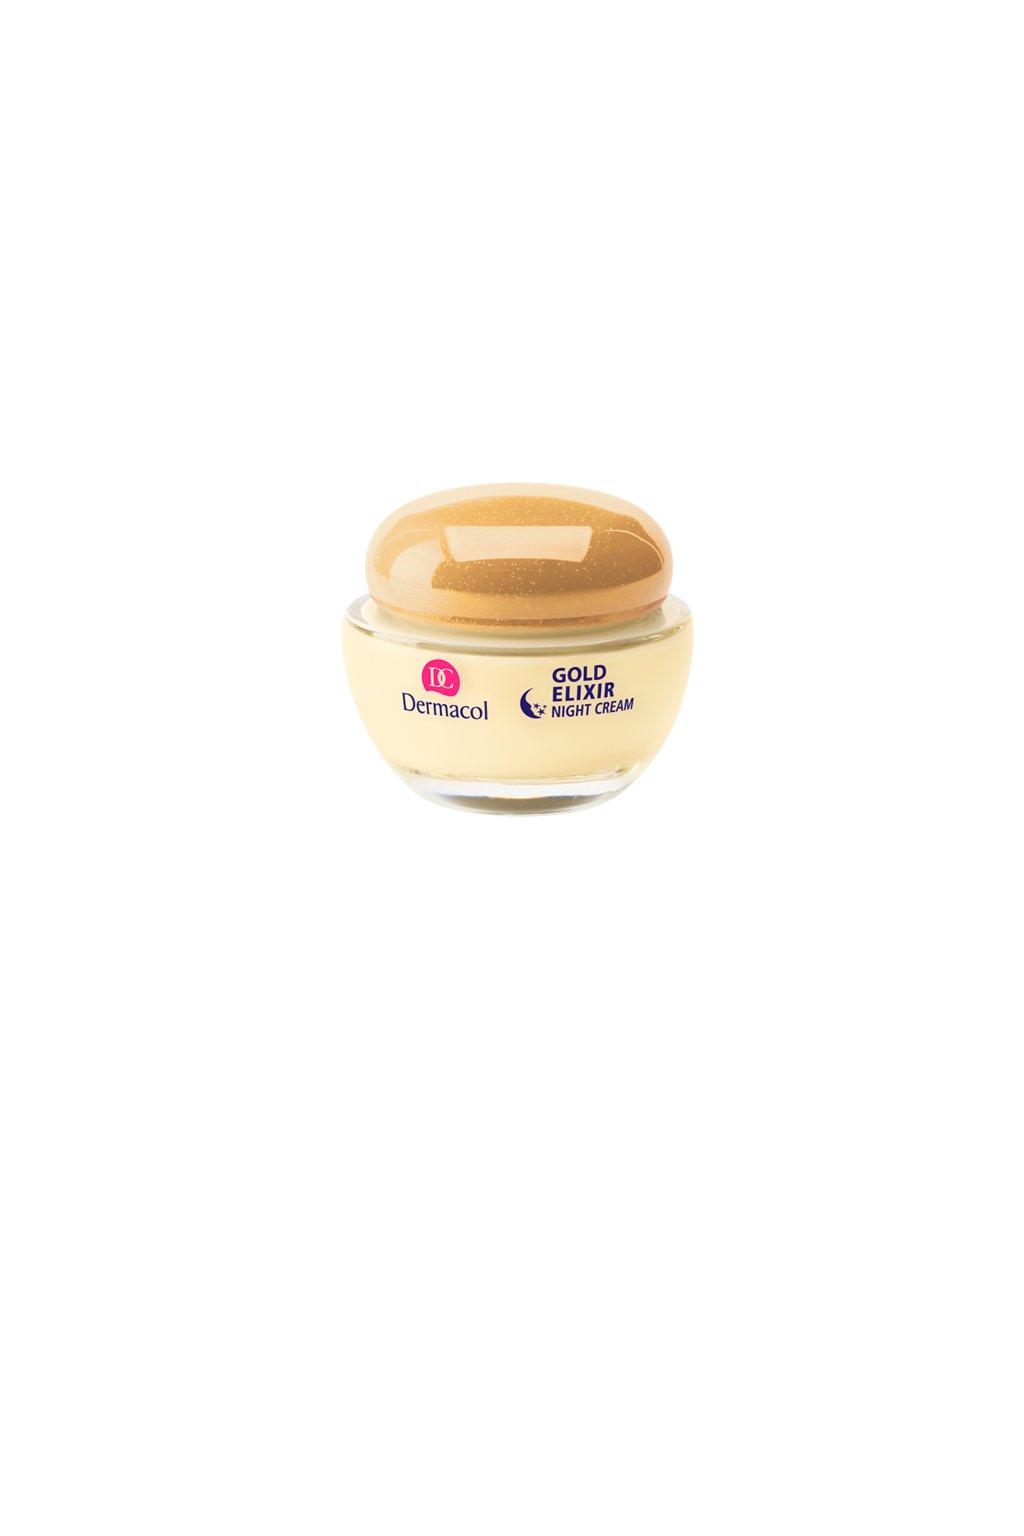 dermacol gold elixir caviar night cream omlazujici kaviarovy nocni krem